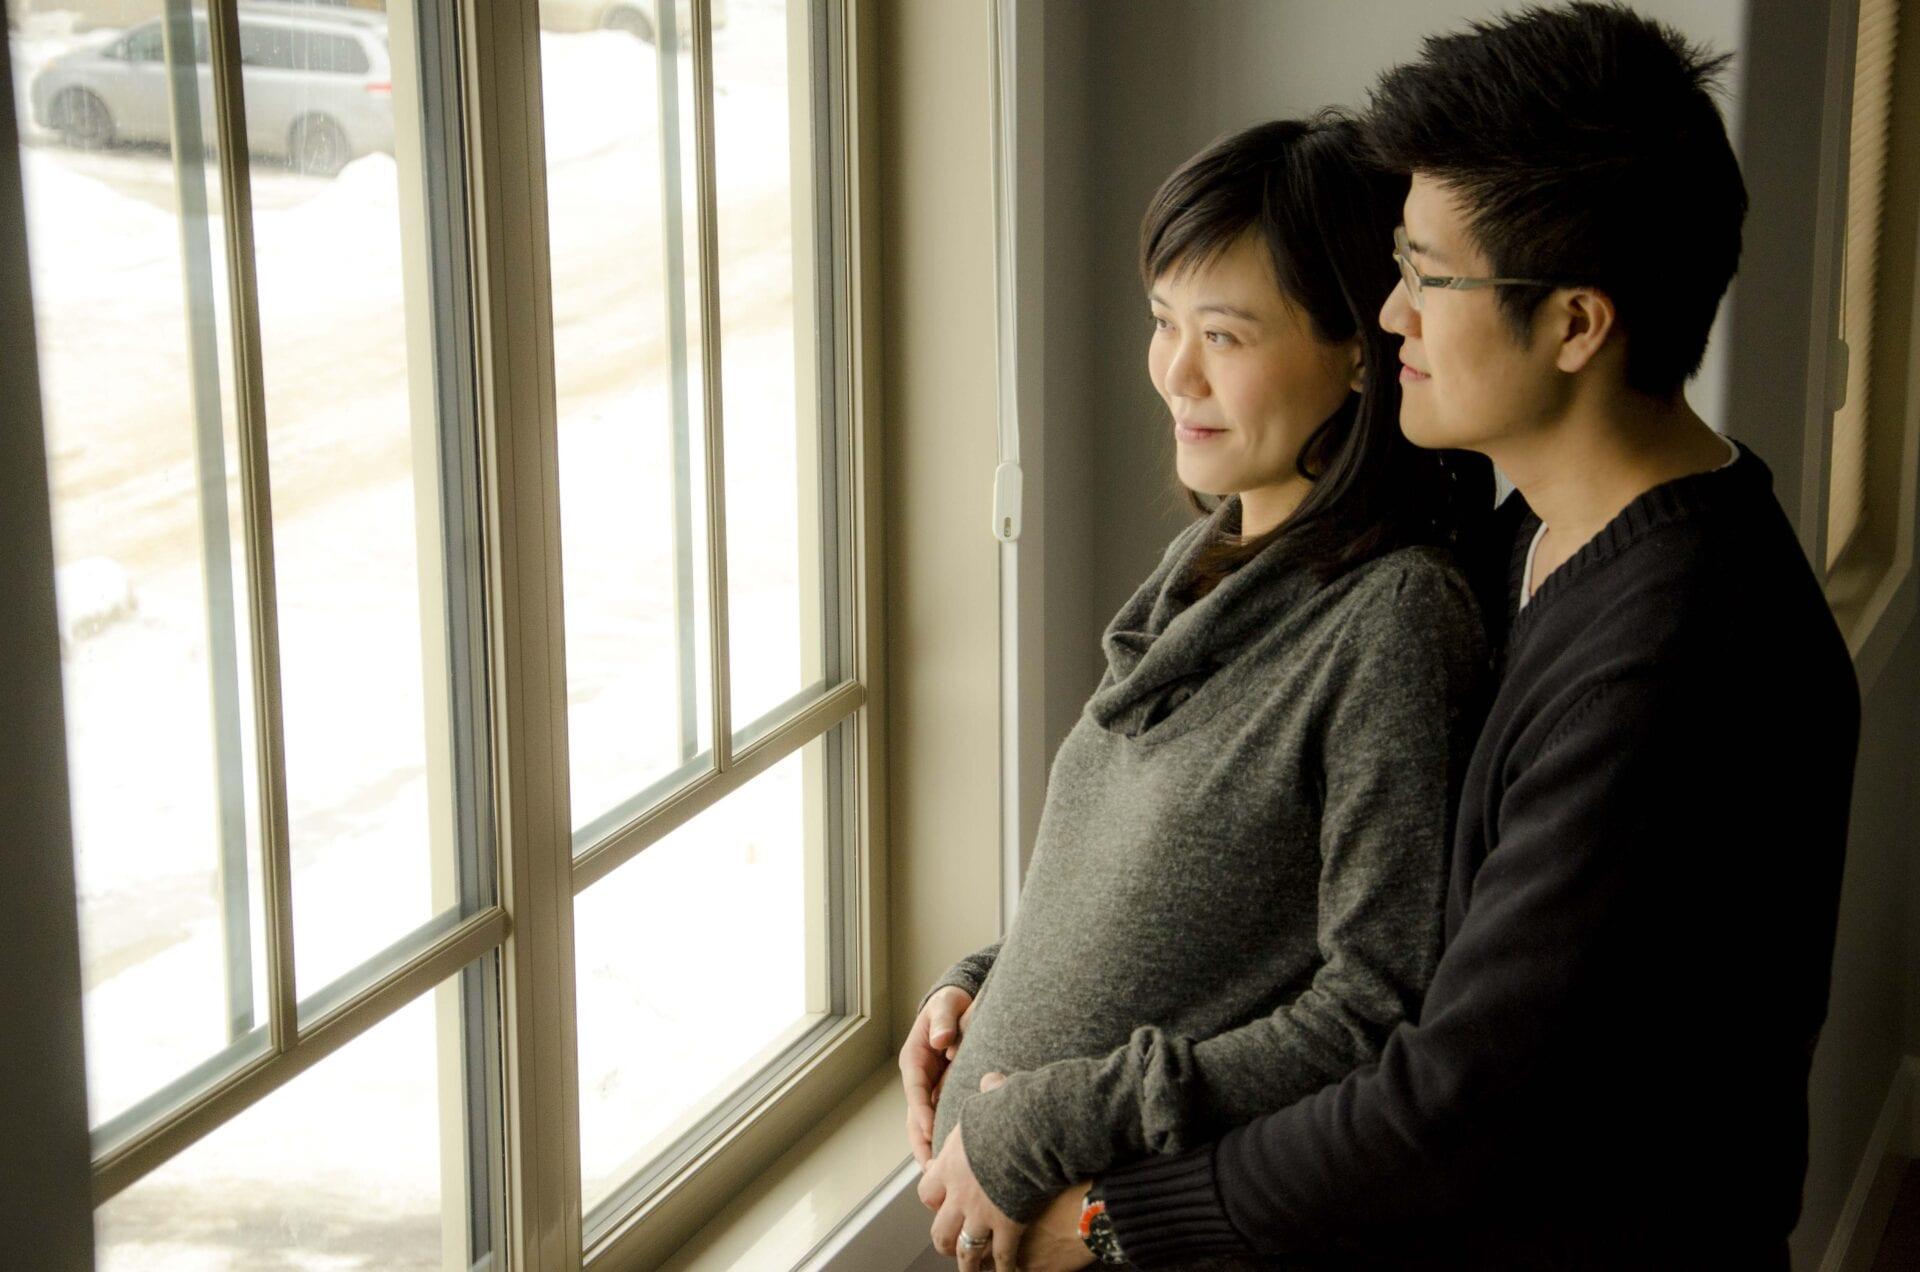 Edmonton Maternity Photography Session (9)